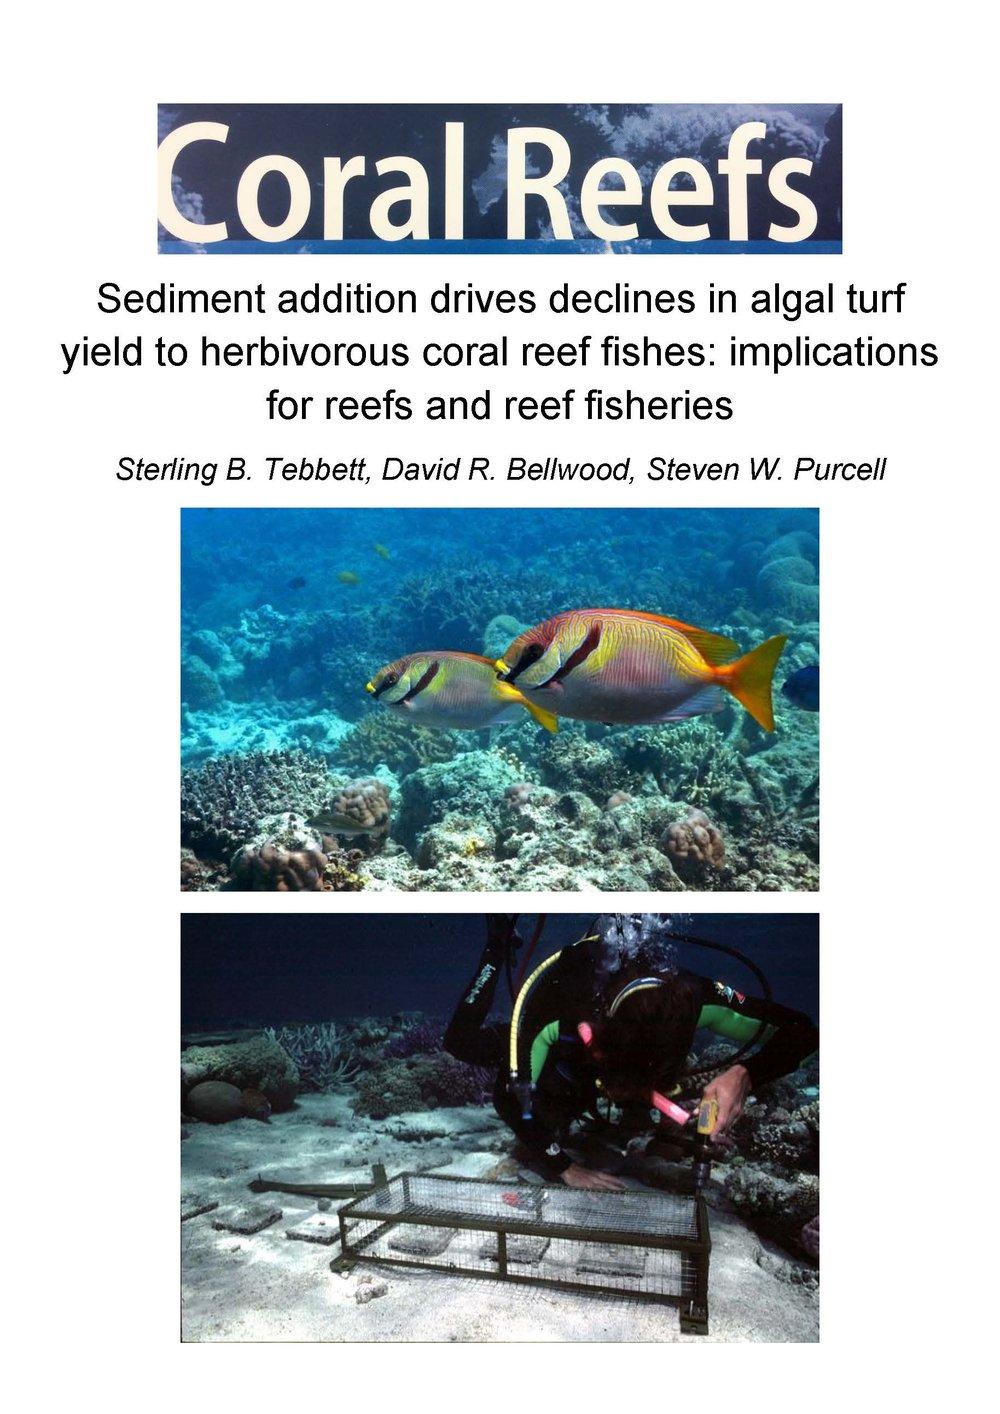 Tebbett et al. 2018 (Coral Reefs).jpg